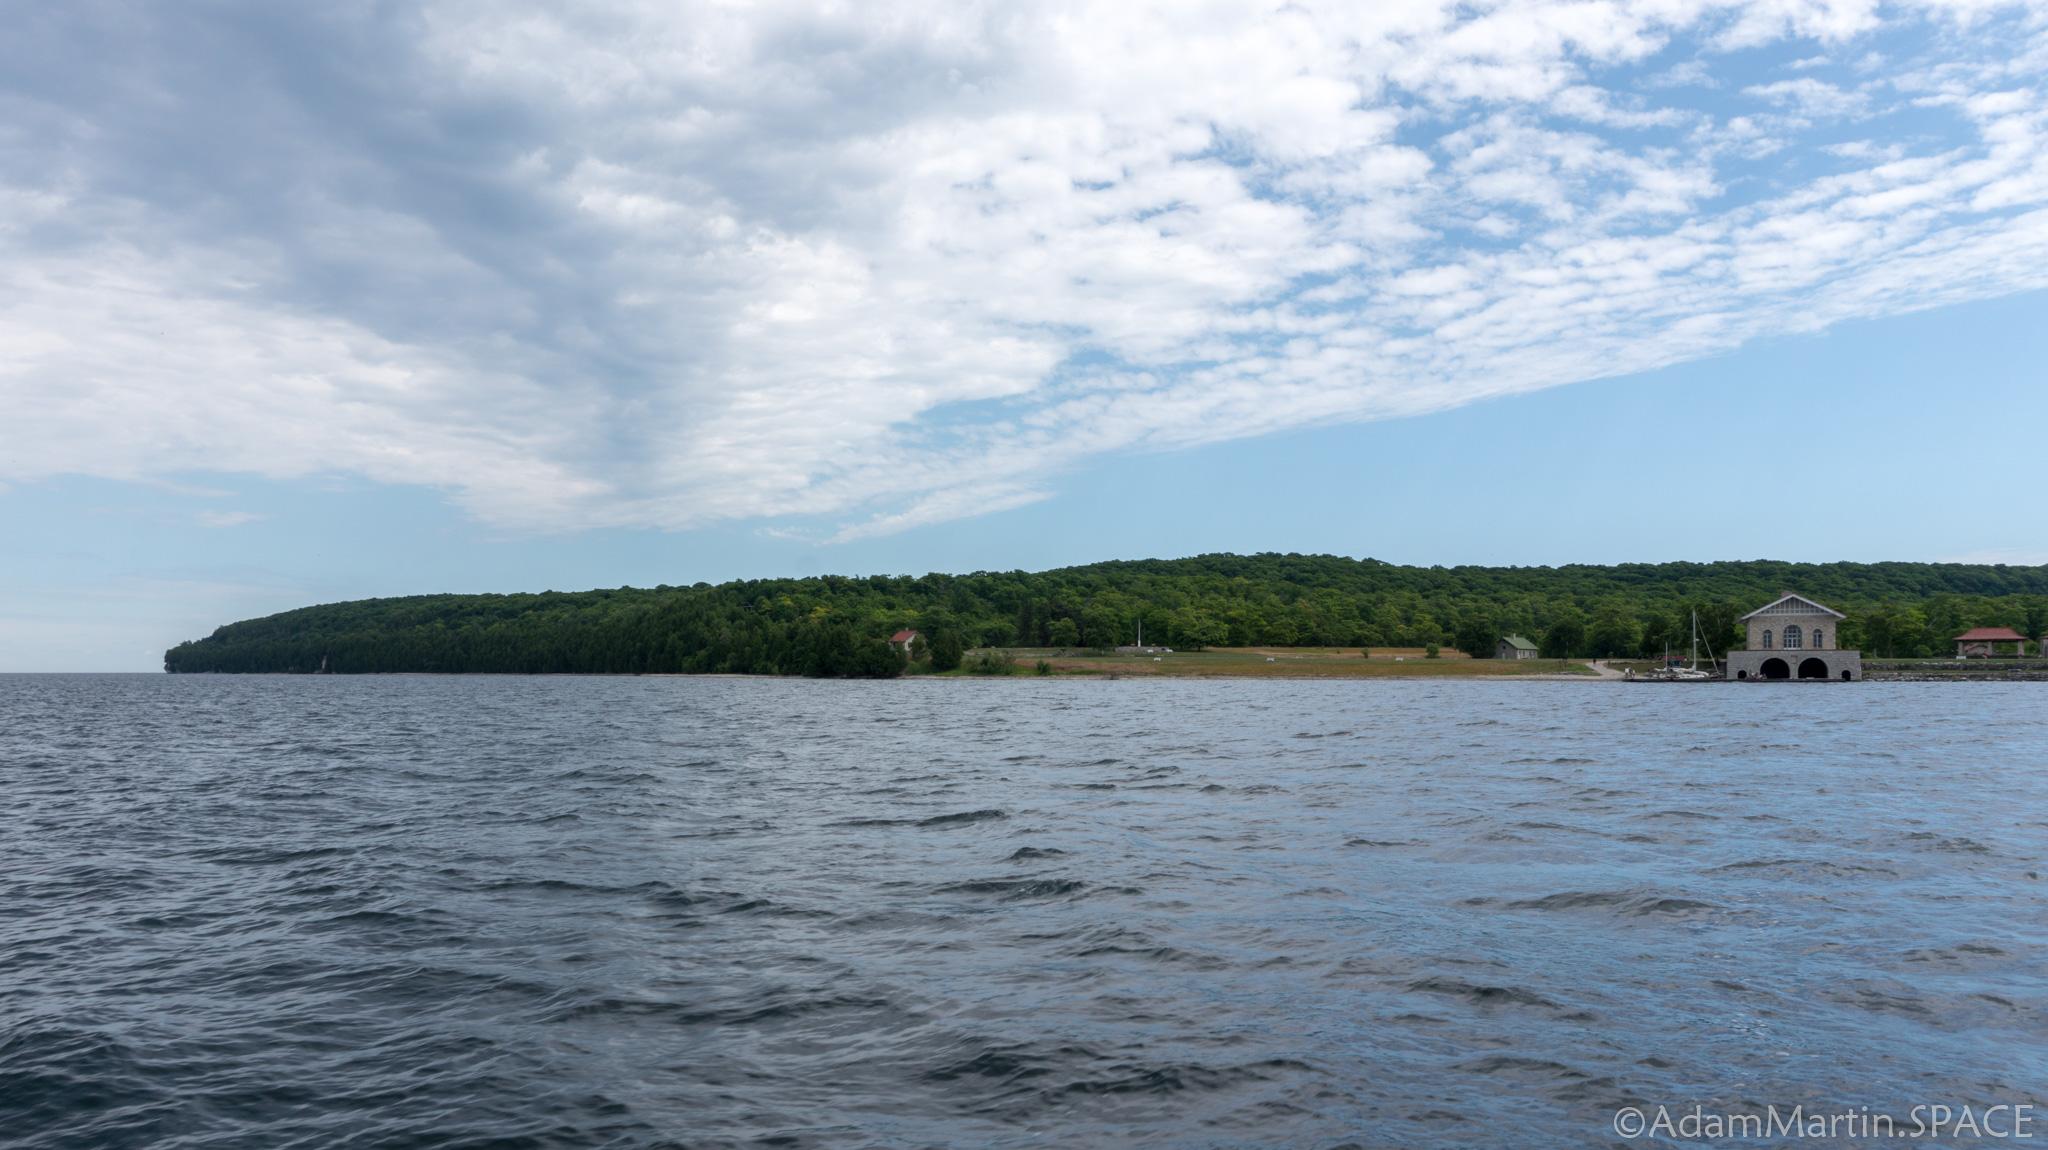 Rock Island State Park - Taking the Karfi ferry